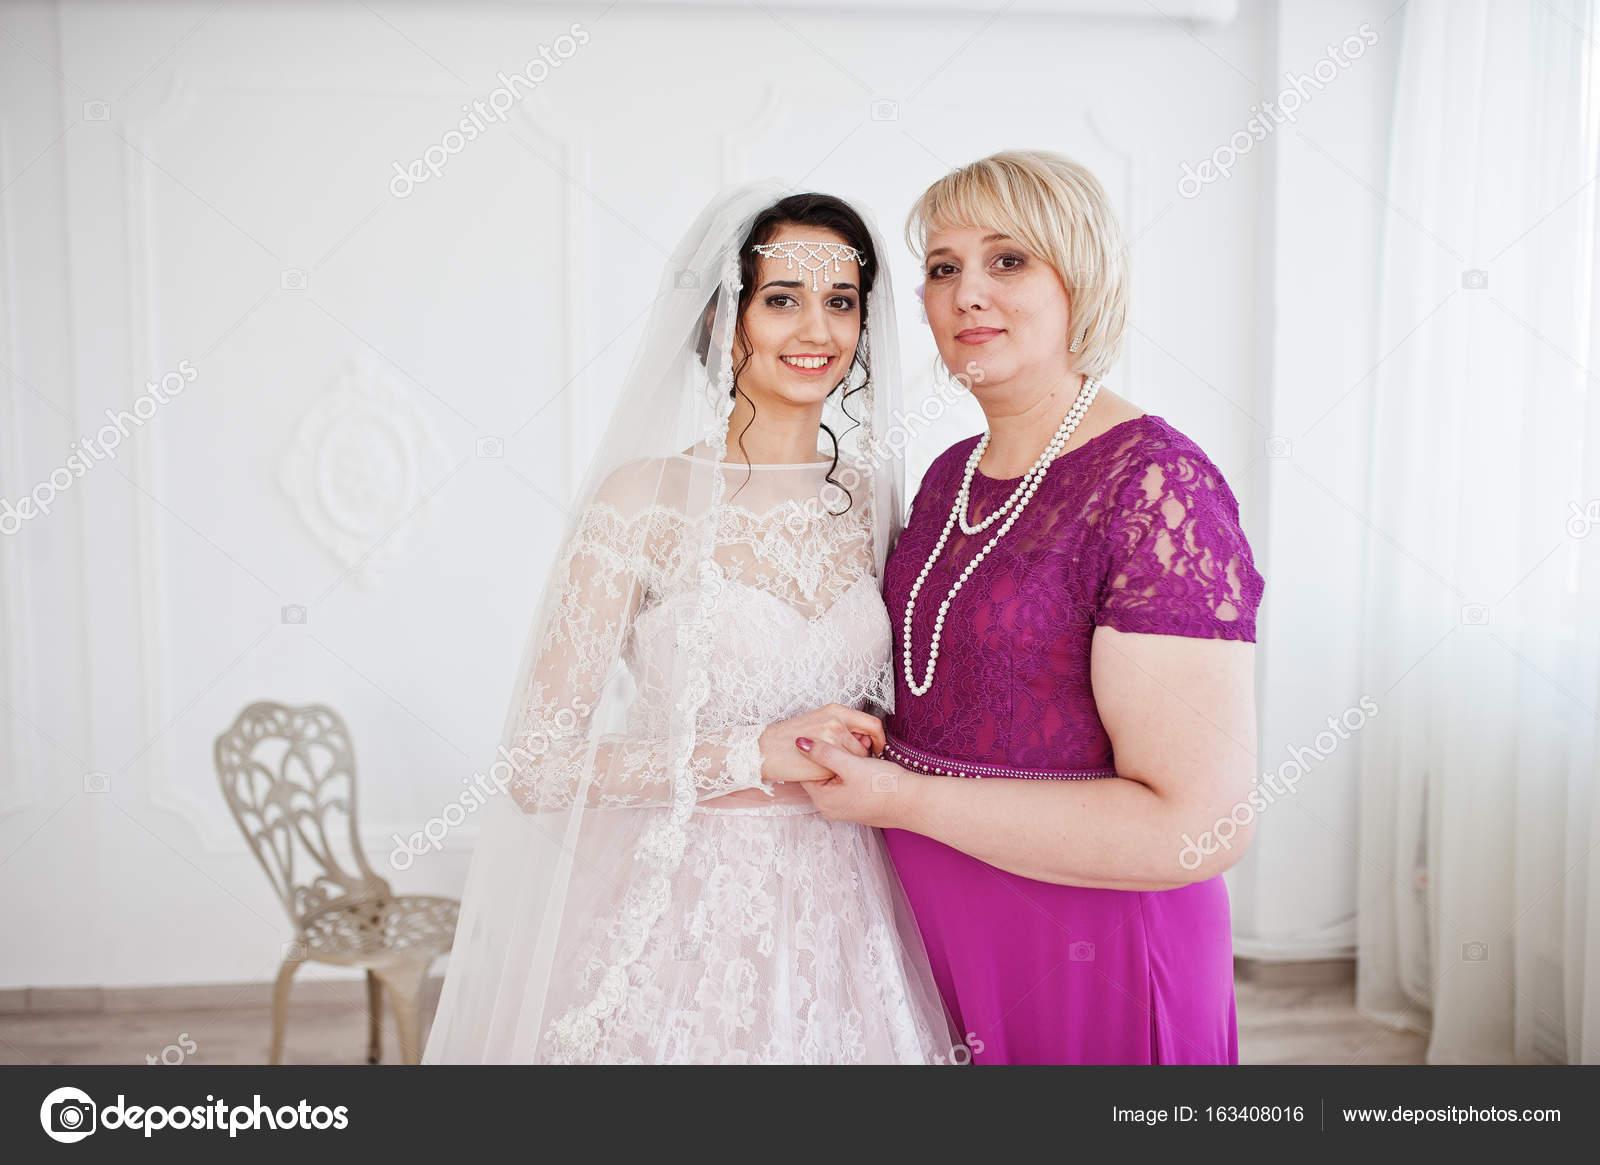 Krasna Nevesta Svatebni Saty Pozuje Se Svou Matkou V Purple Lo